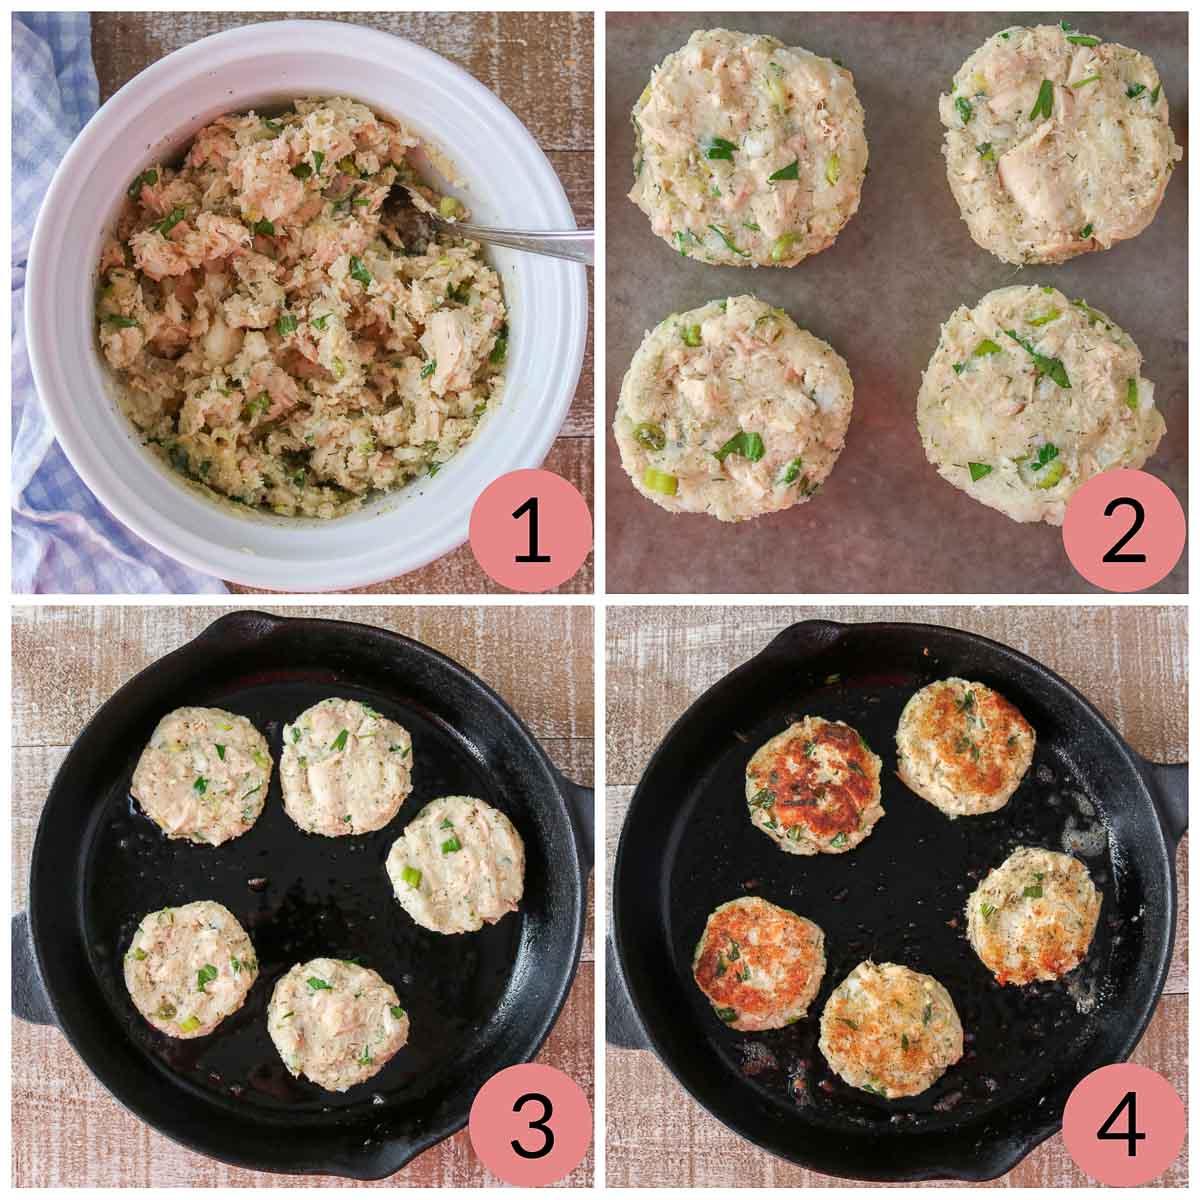 Collage of steps to make tuna potato patties.